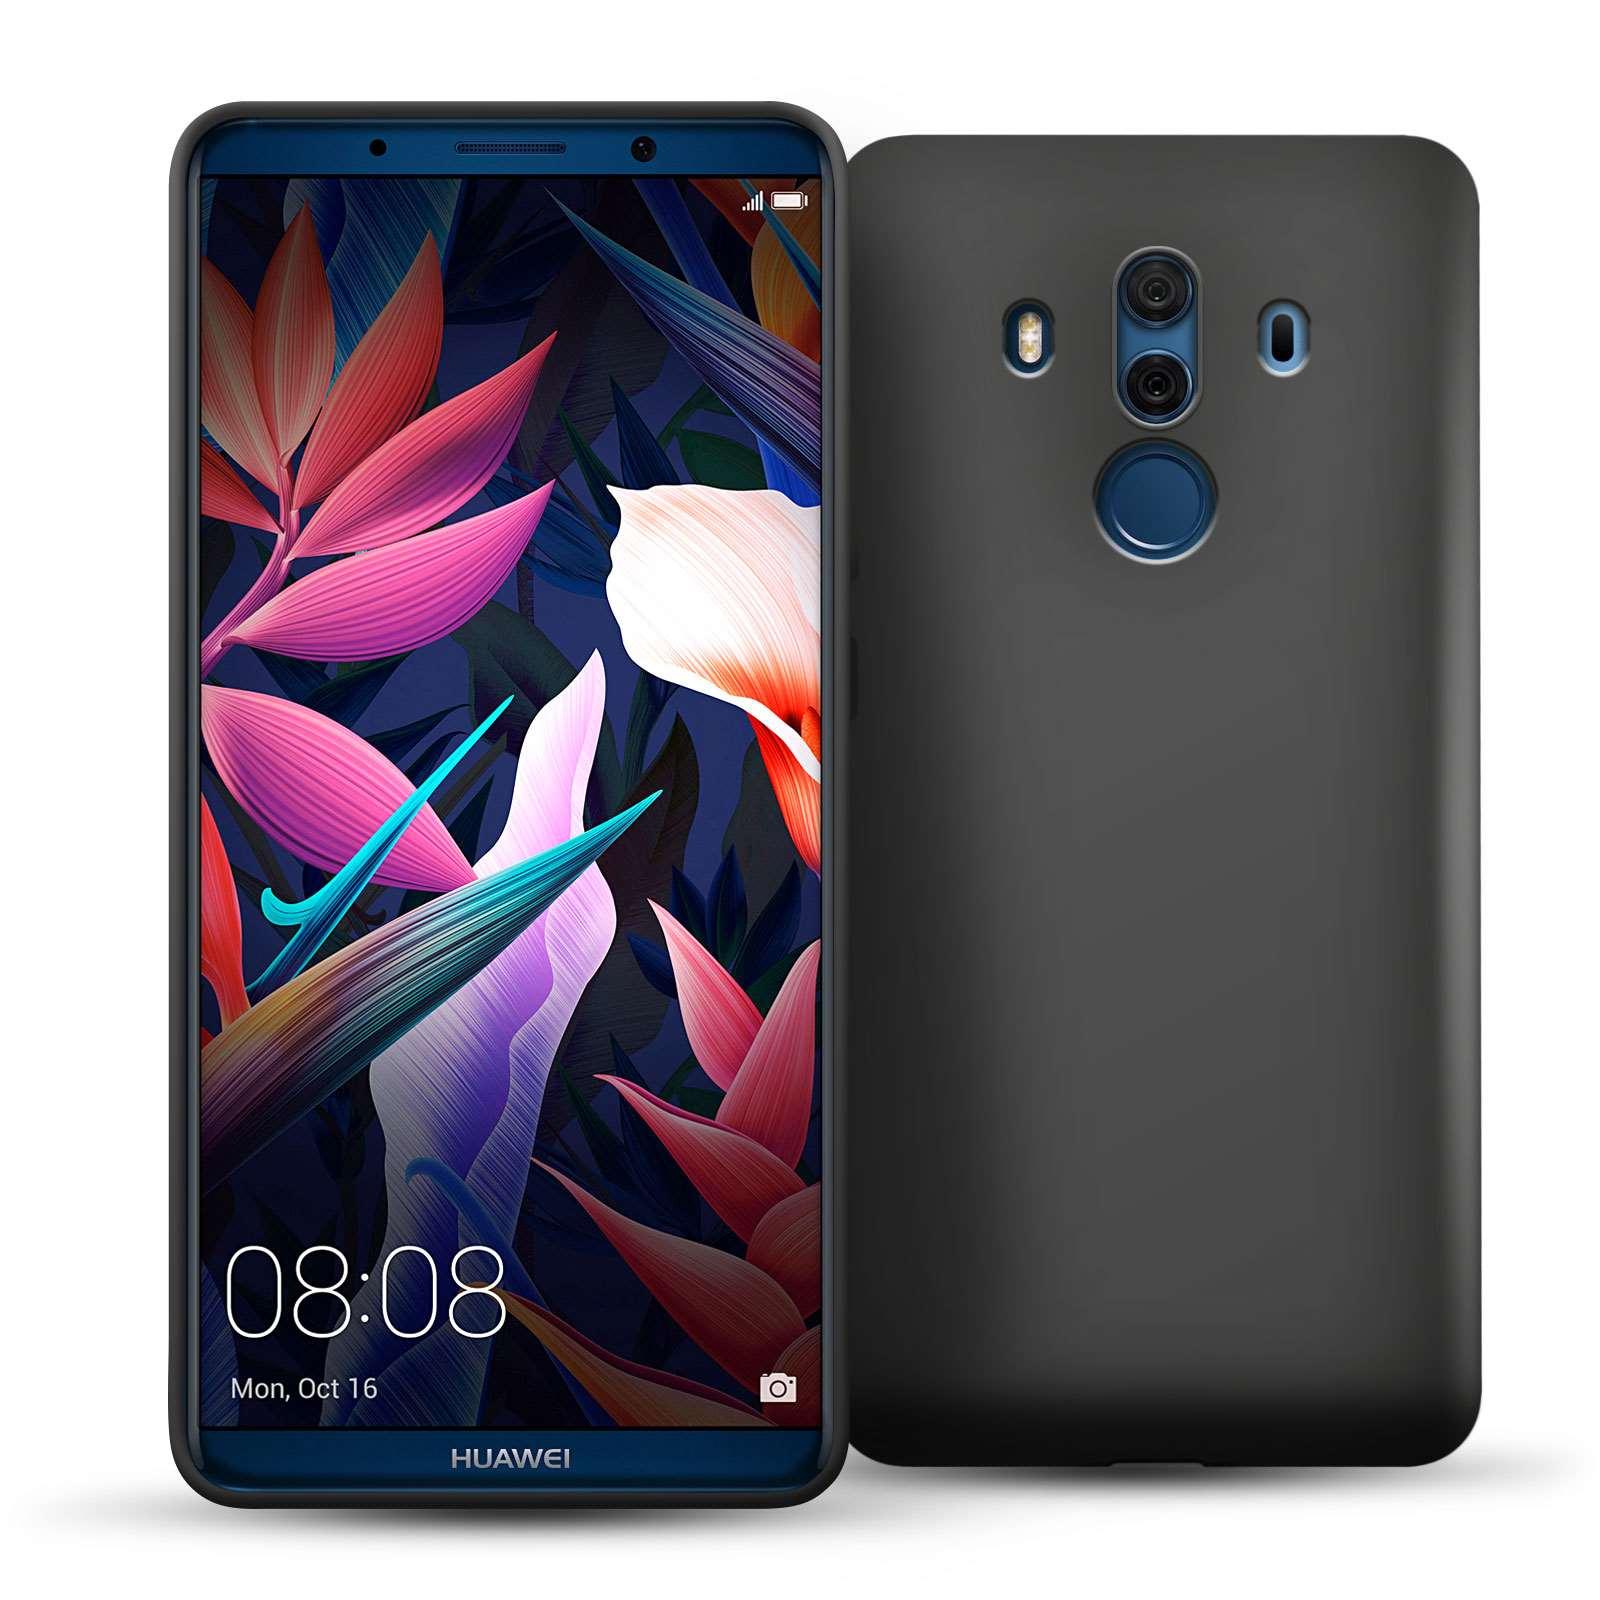 Caseflex Θήκη Σιλικόνης Huawei Mate 10 Pro - Matte Black (HU-AW03-Z519)